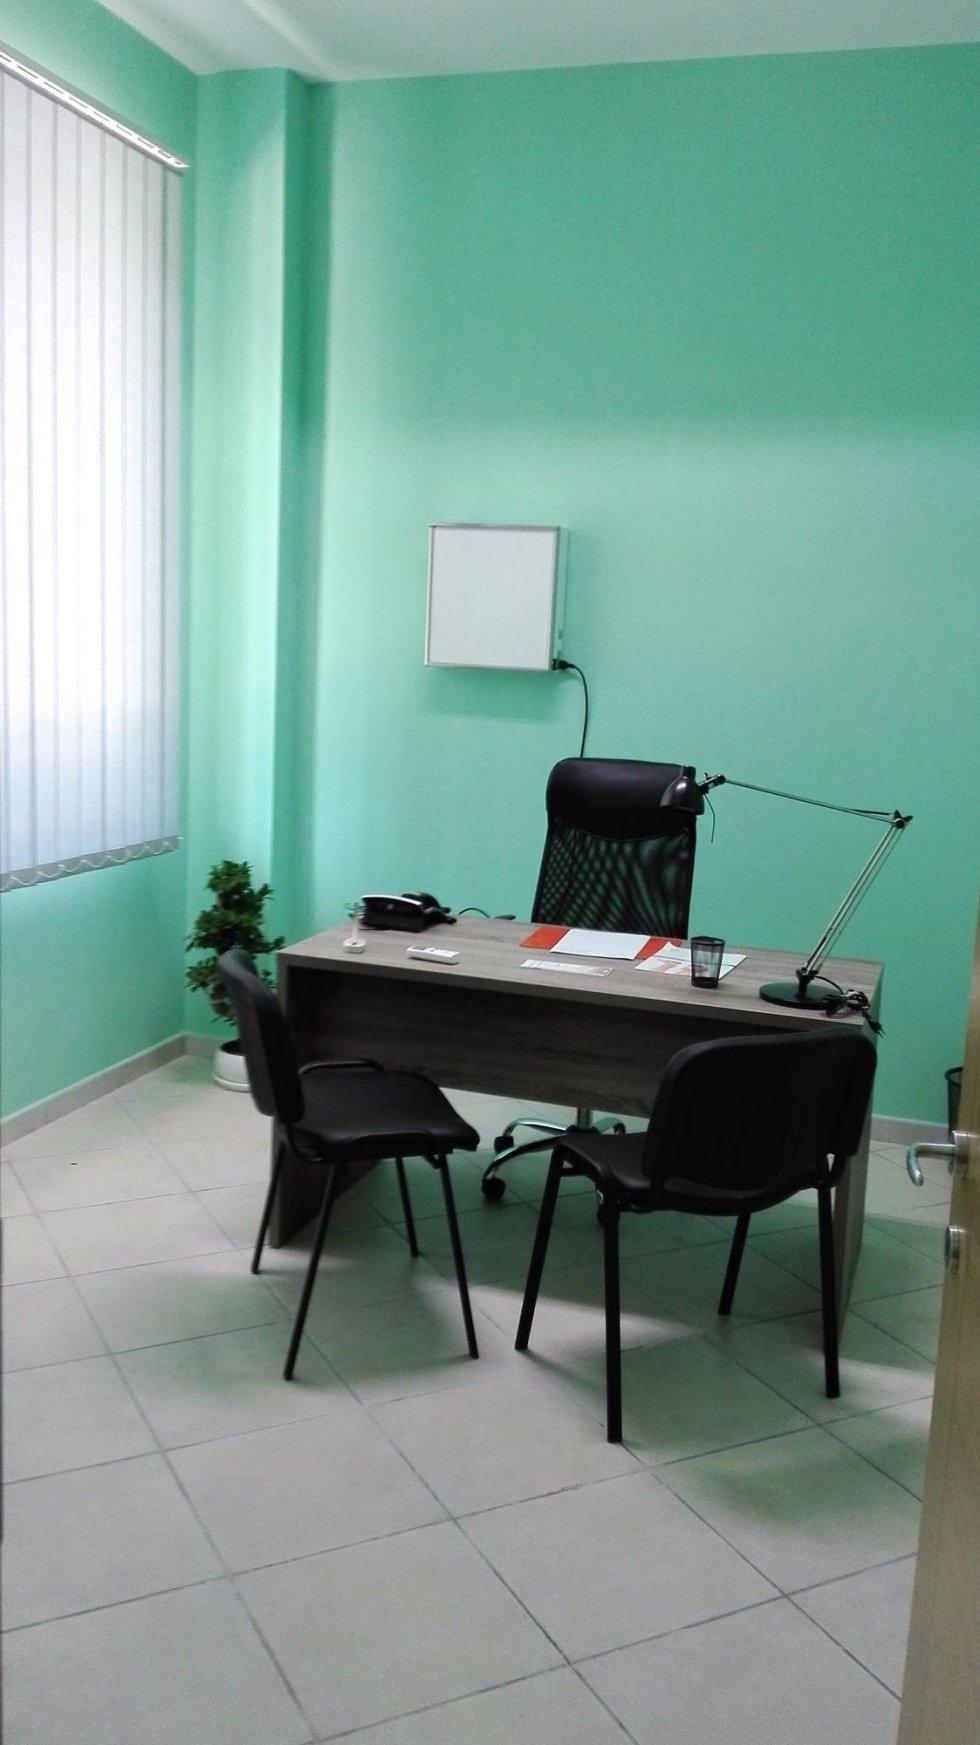 Centro Medico Diagnostico Nicomed